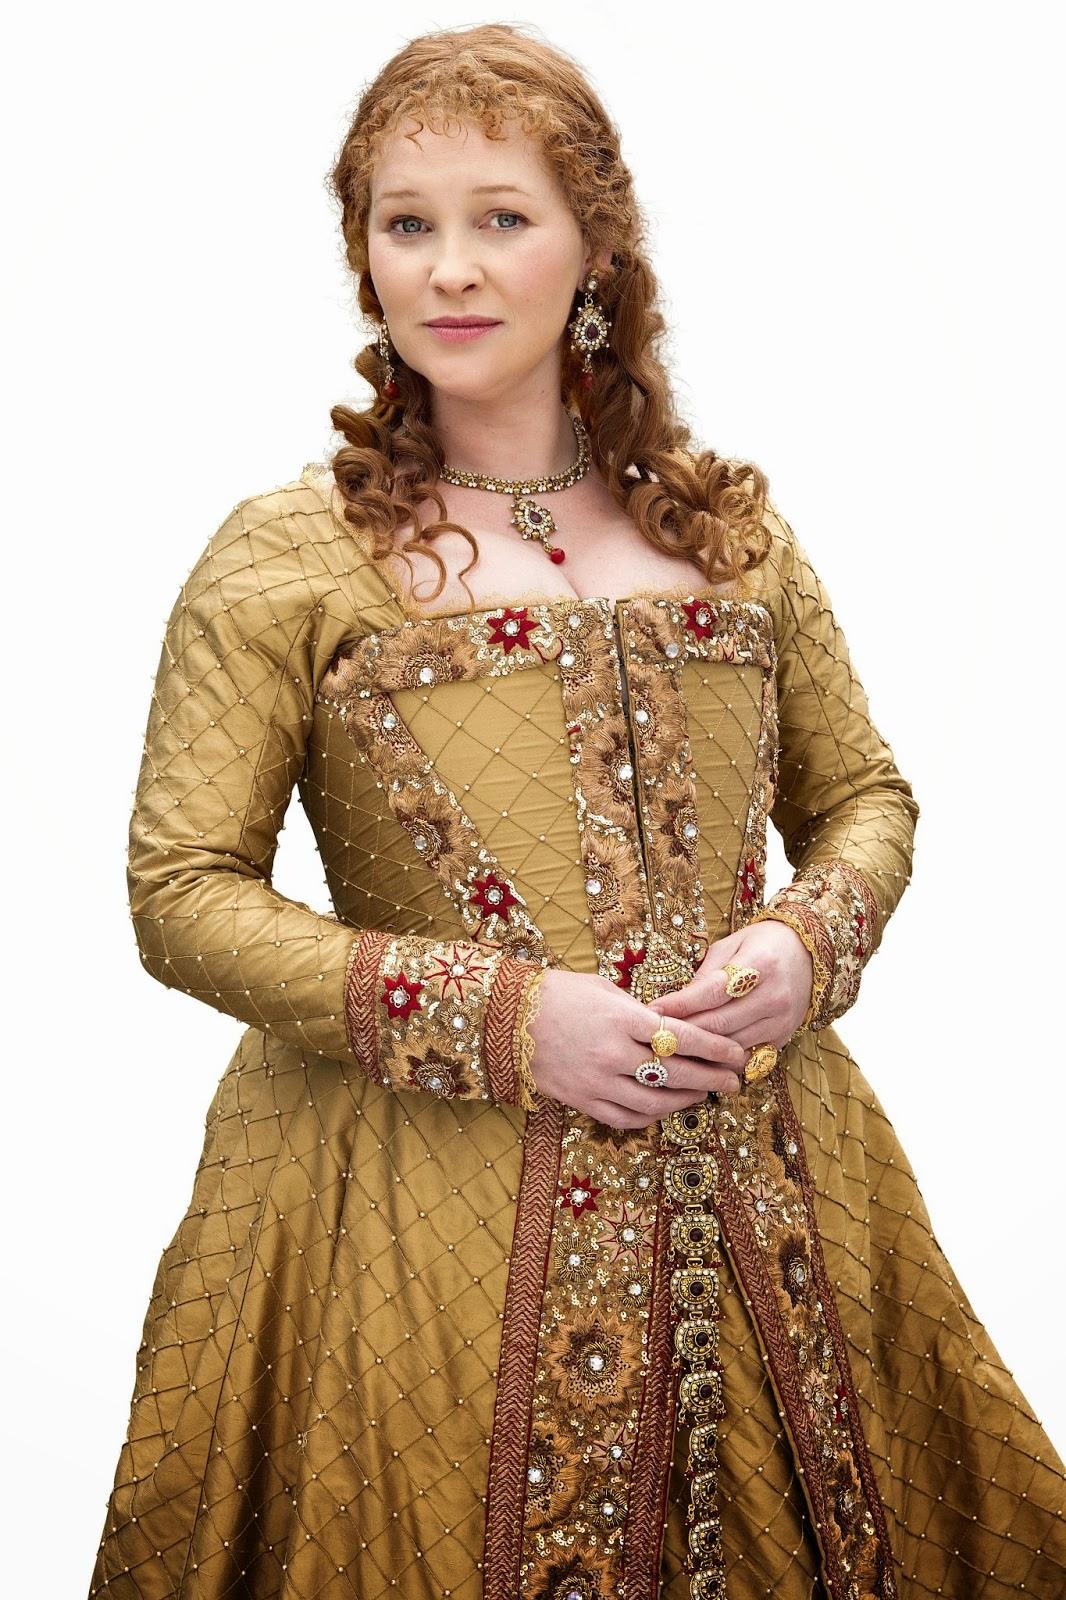 Doctor Who – Queen Elizabeth I. – Naergi's Costuming Site